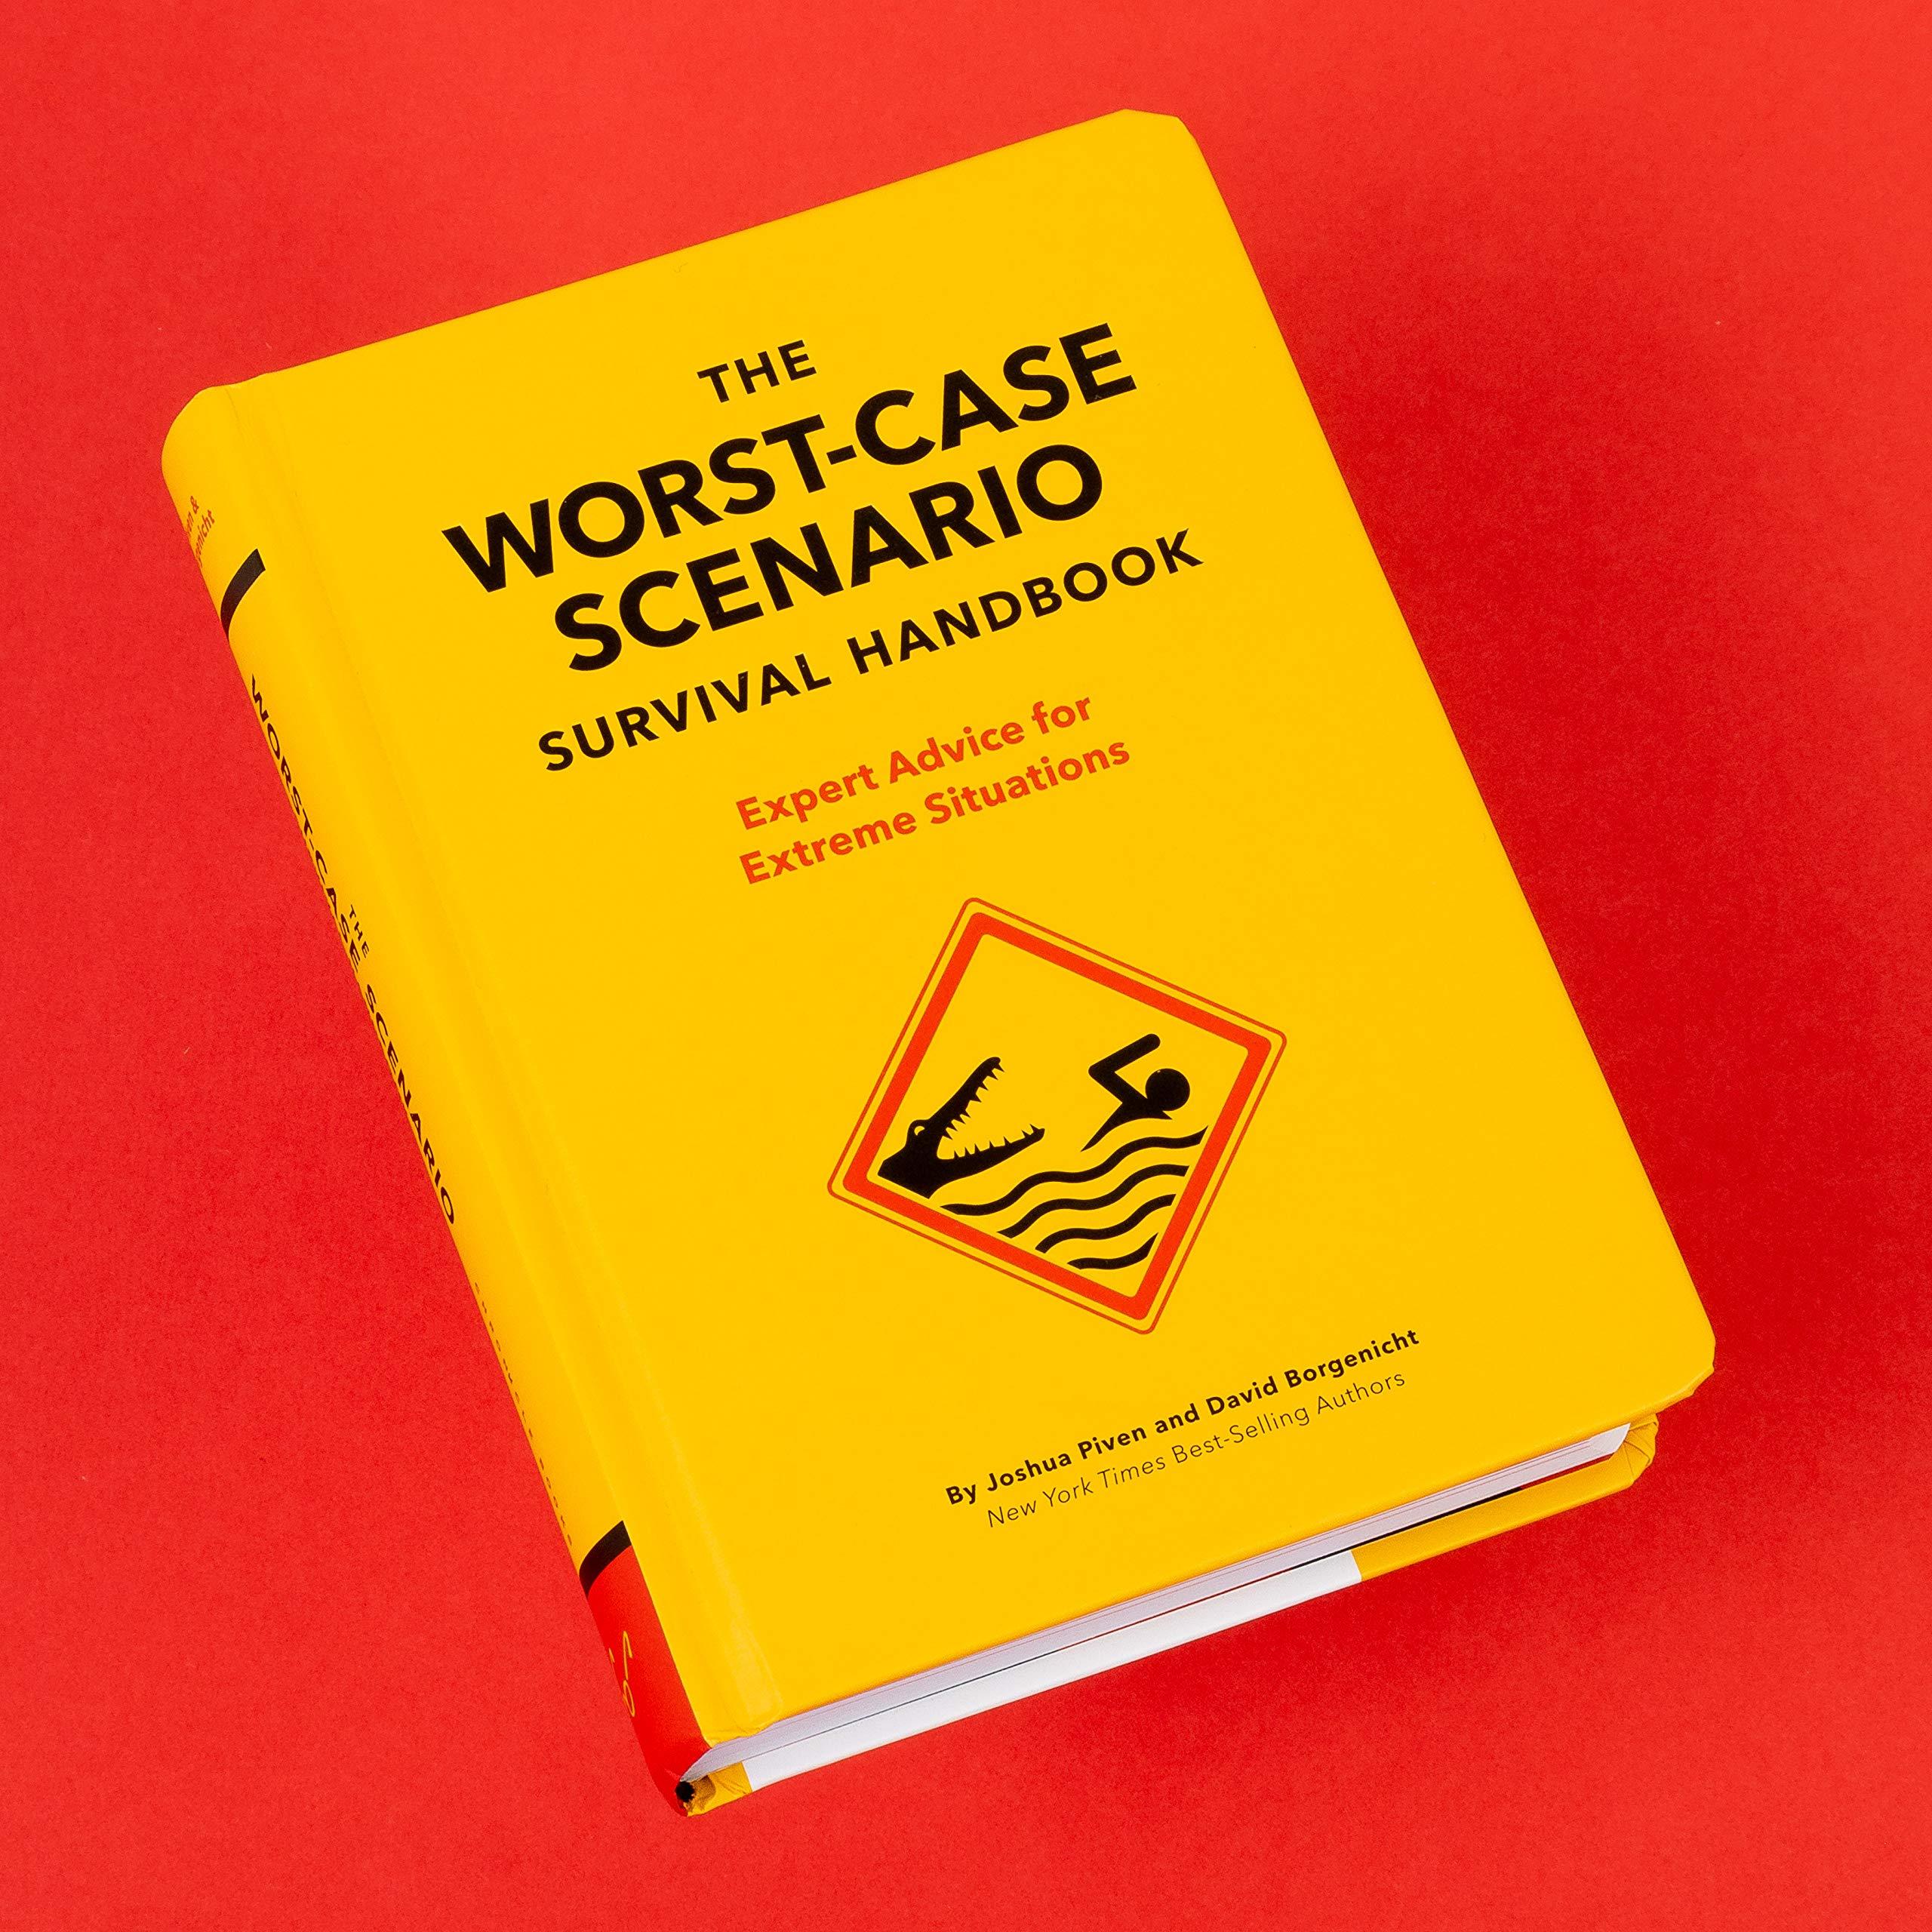 The Worst-Case Scenario Survival Handbook: Expert Advice for